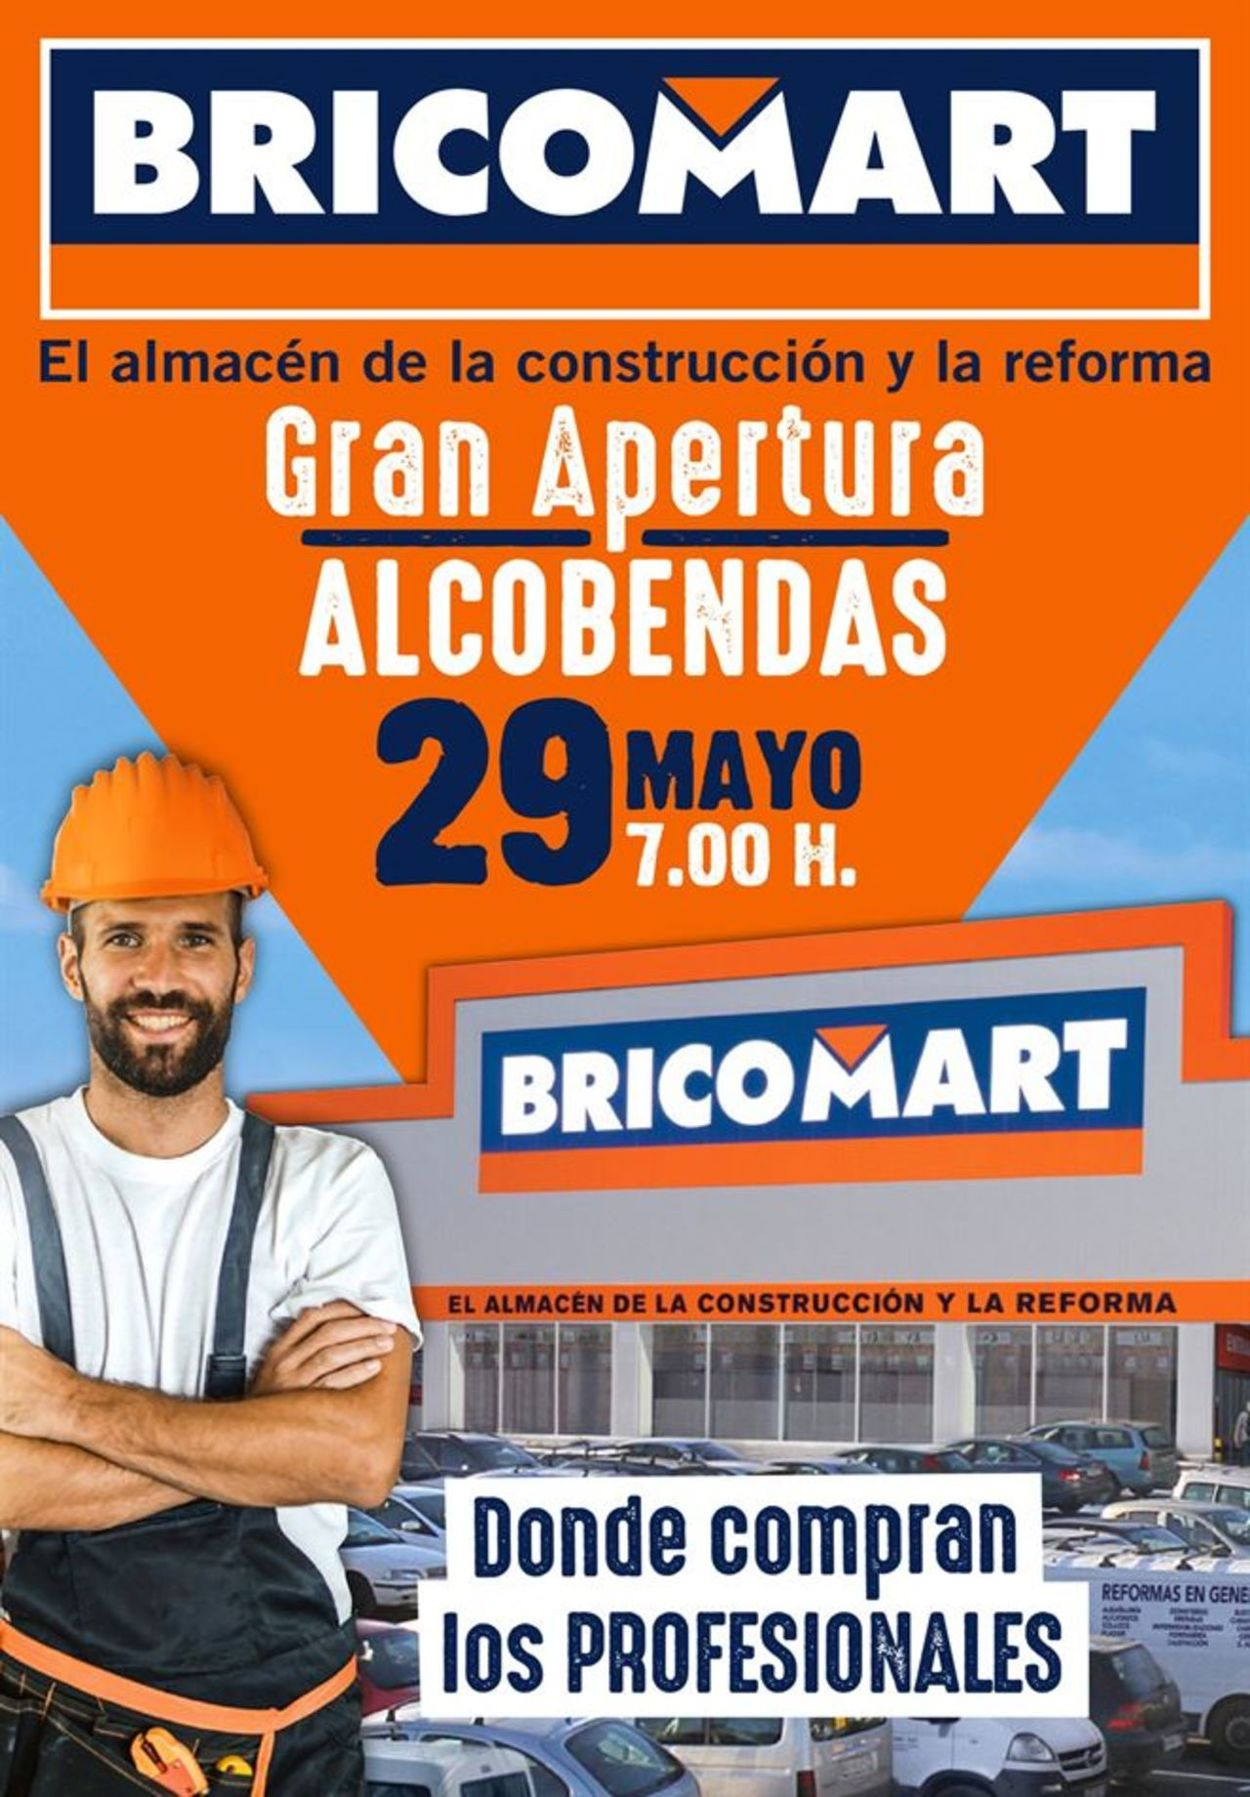 Bricomart Folleto - 29.05-29.06.2019